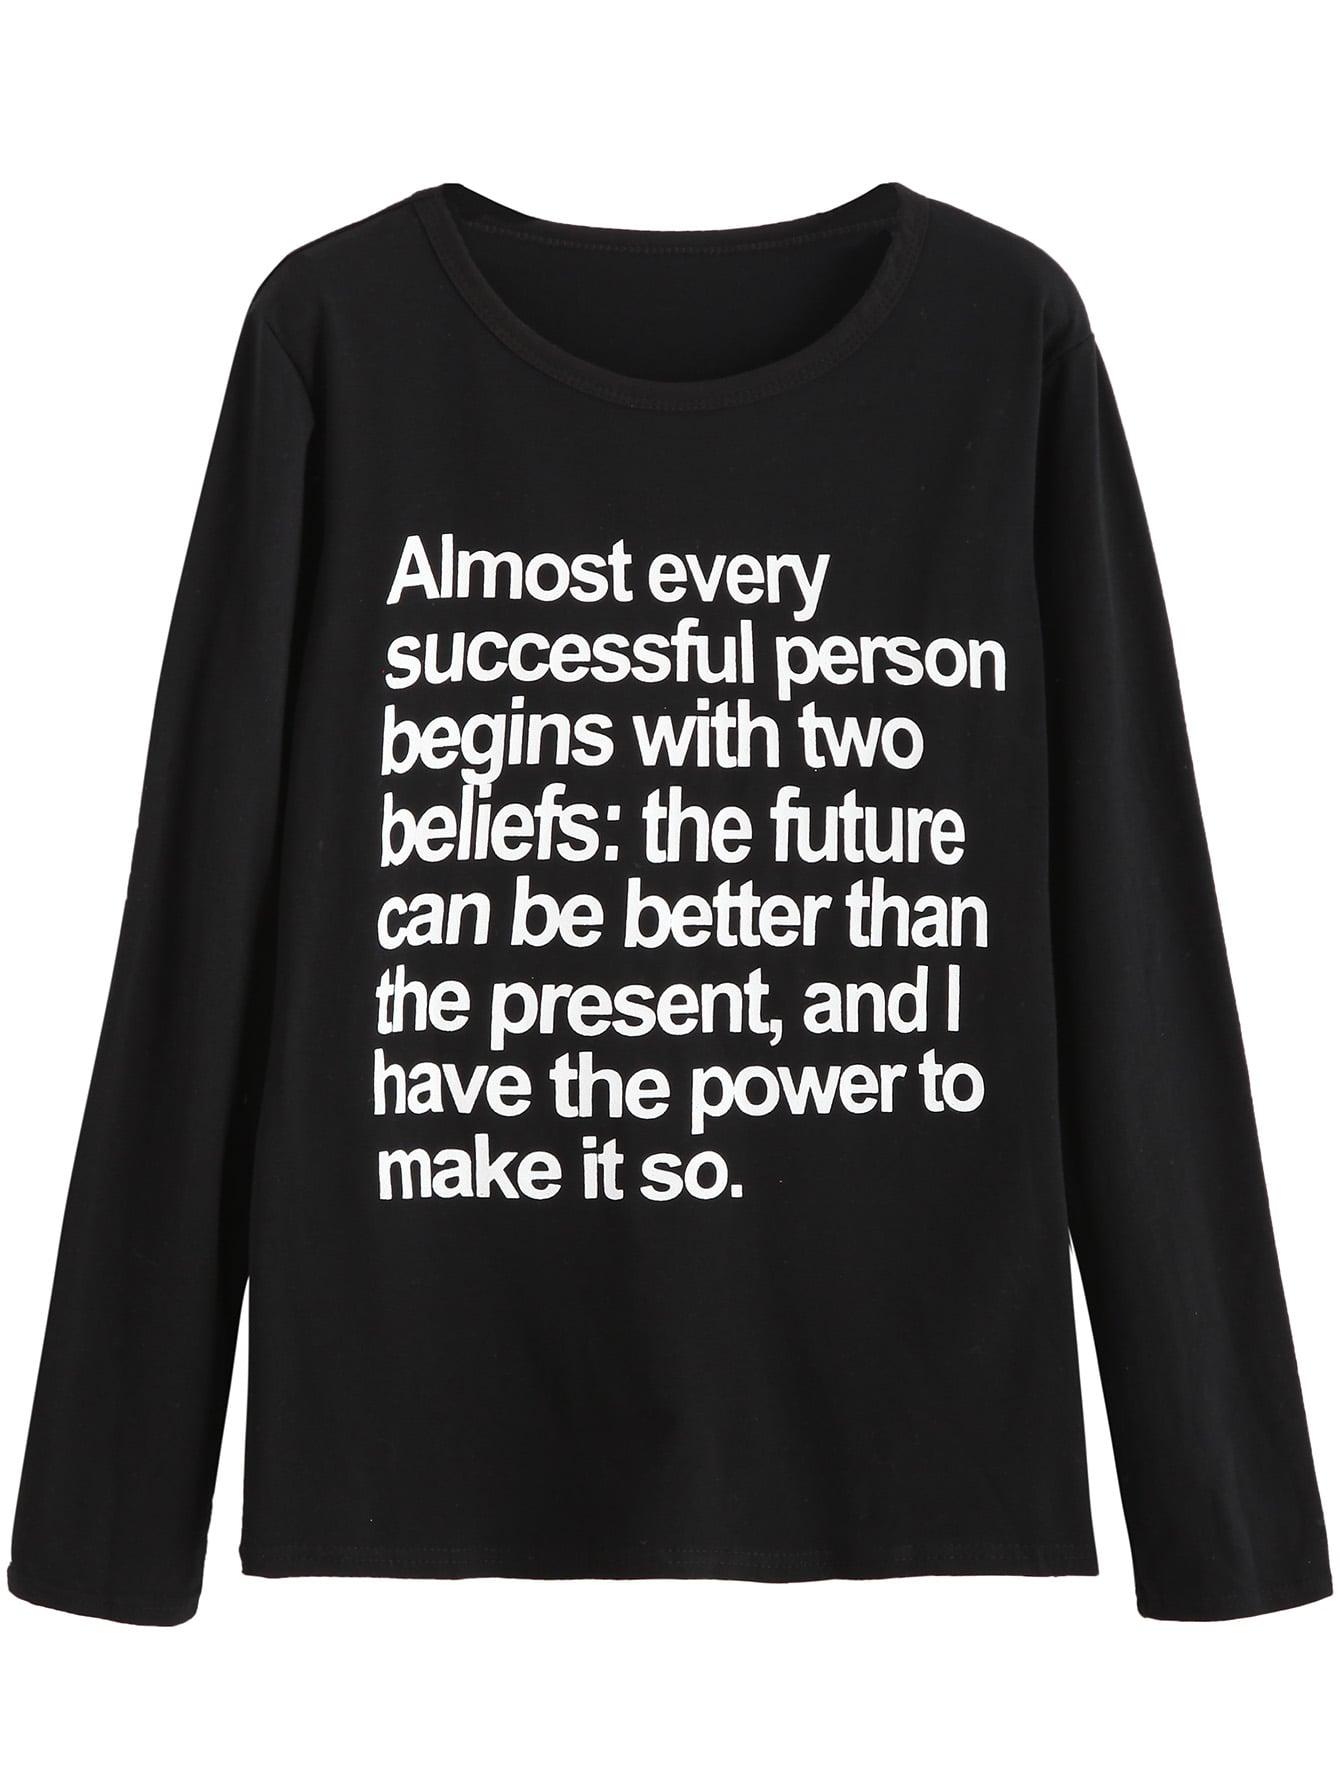 Black Slogan Print T-shirt tee160905121